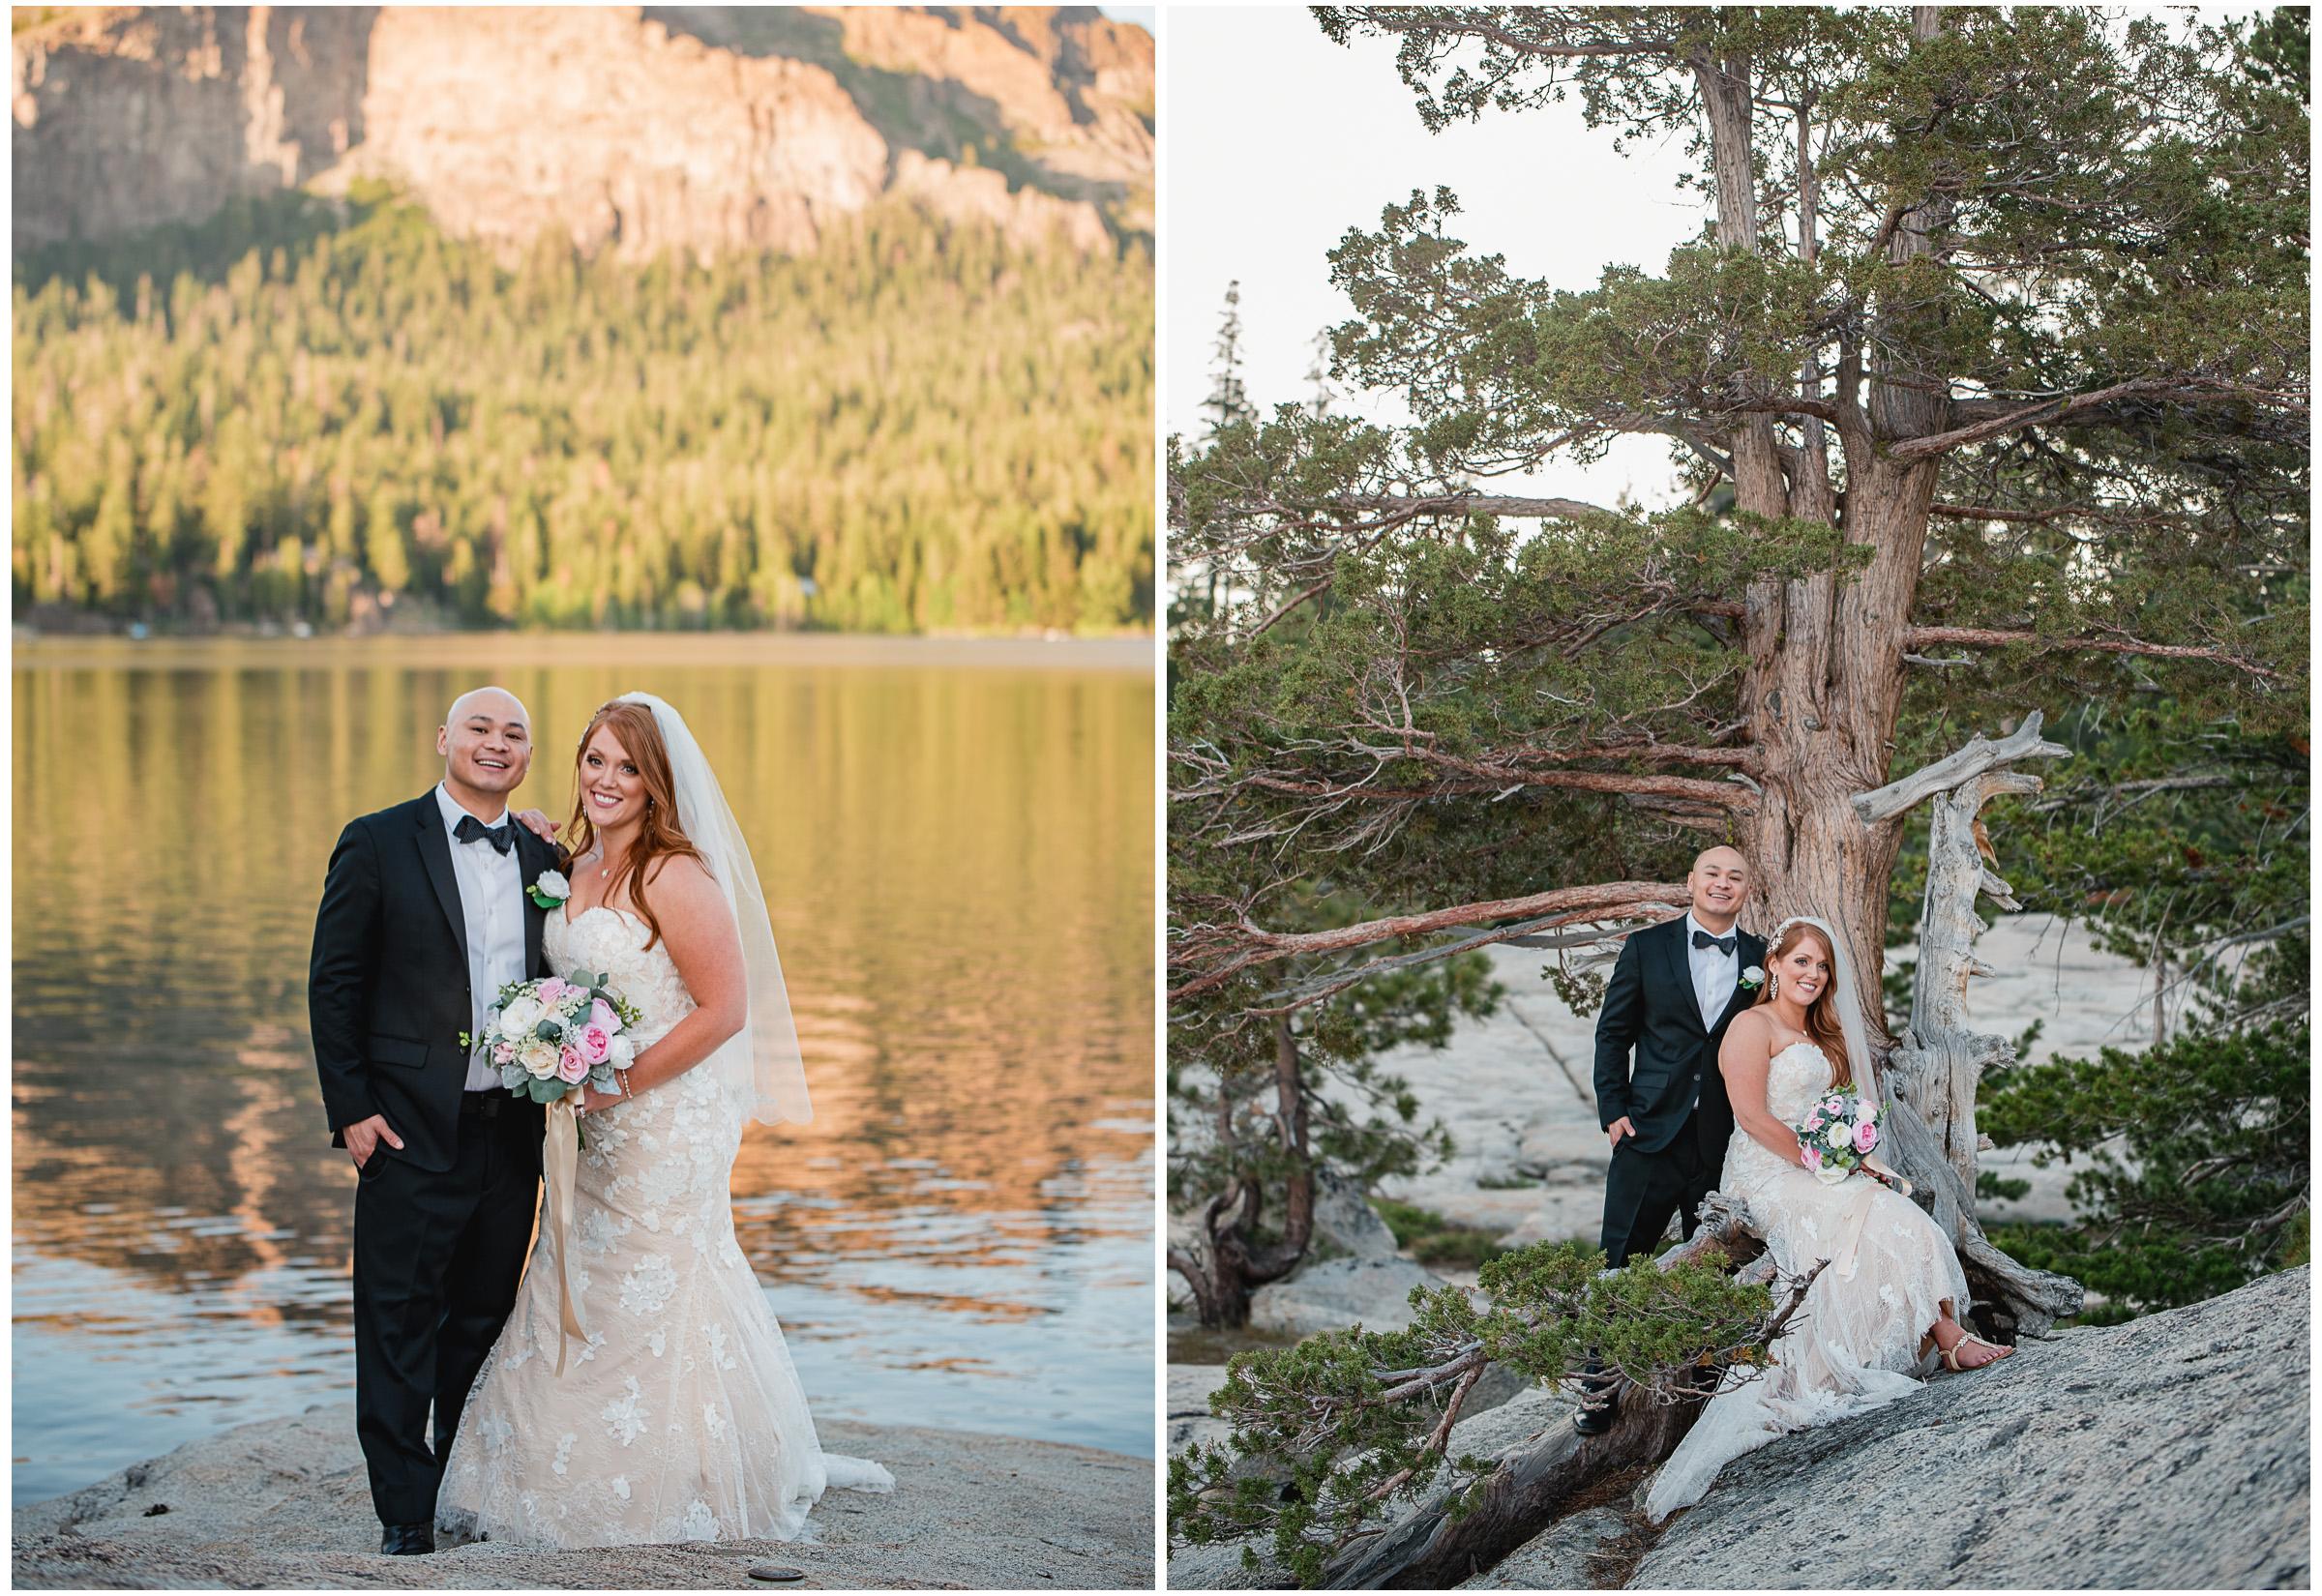 Clarksburg Wedding - Sacramento Photographer - Bogle Winery - Justin Wilcox Photography - 11.jpg